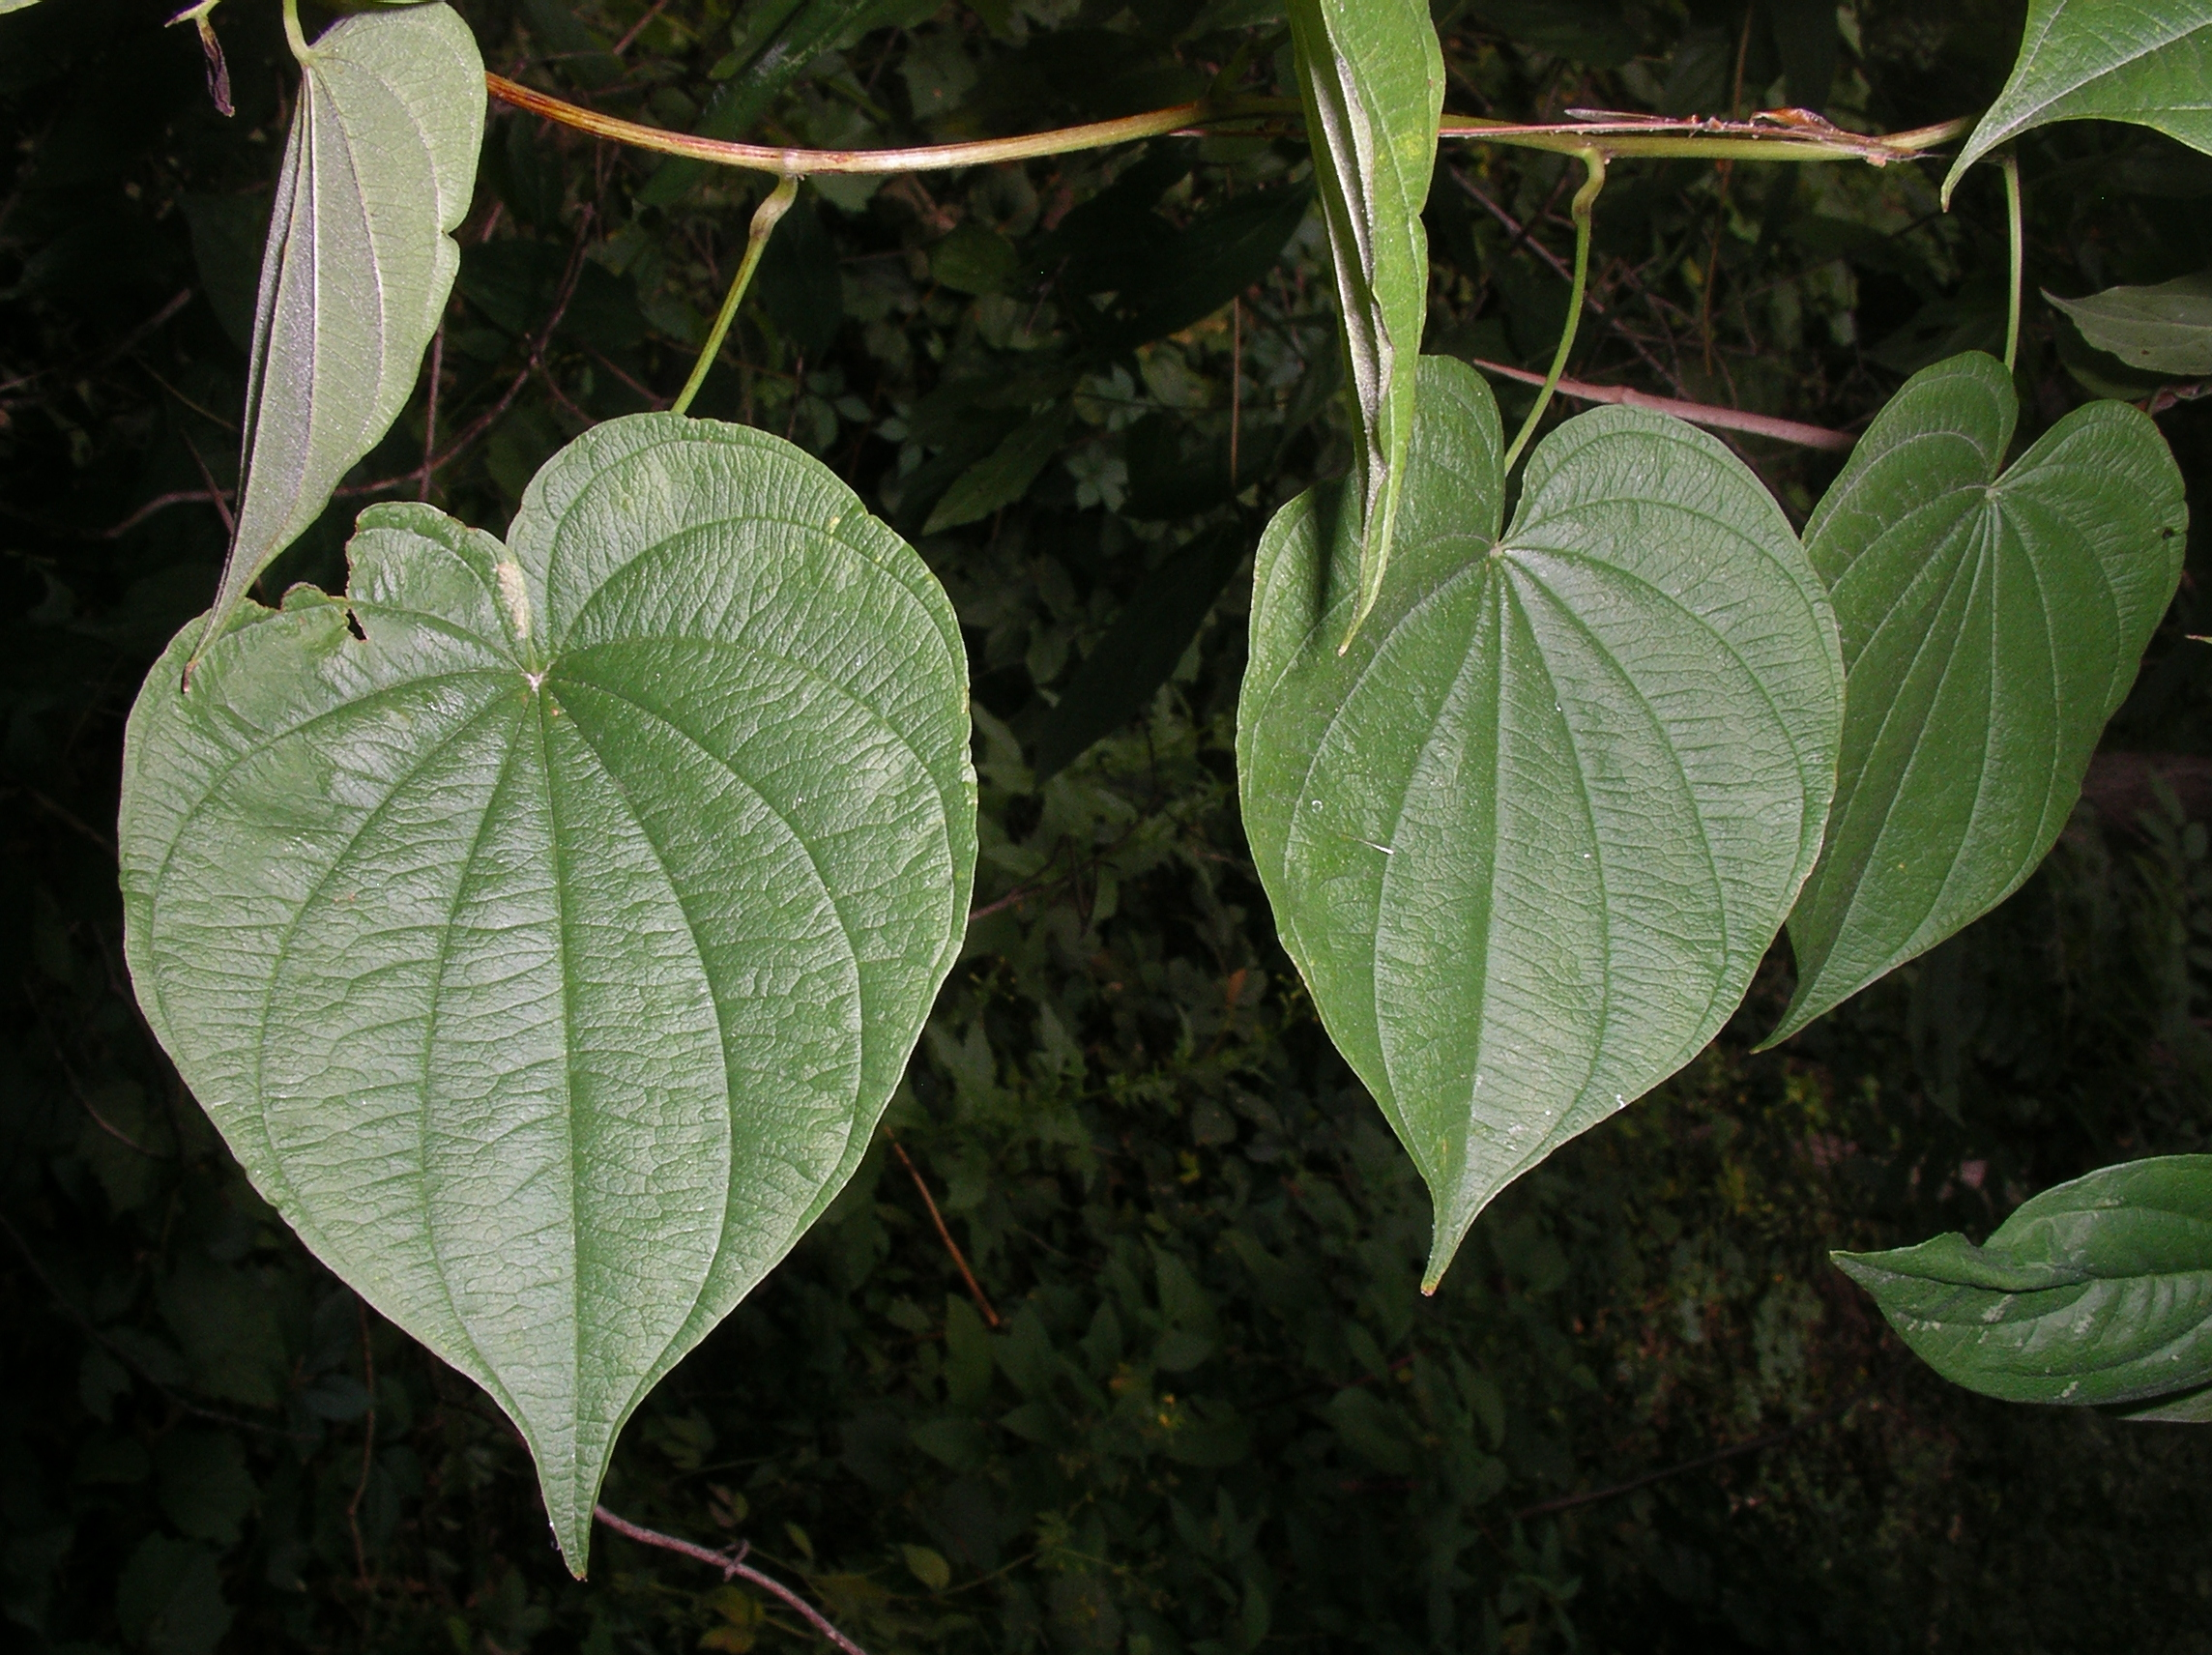 Dioscorea villosa 2LF IsLkRd